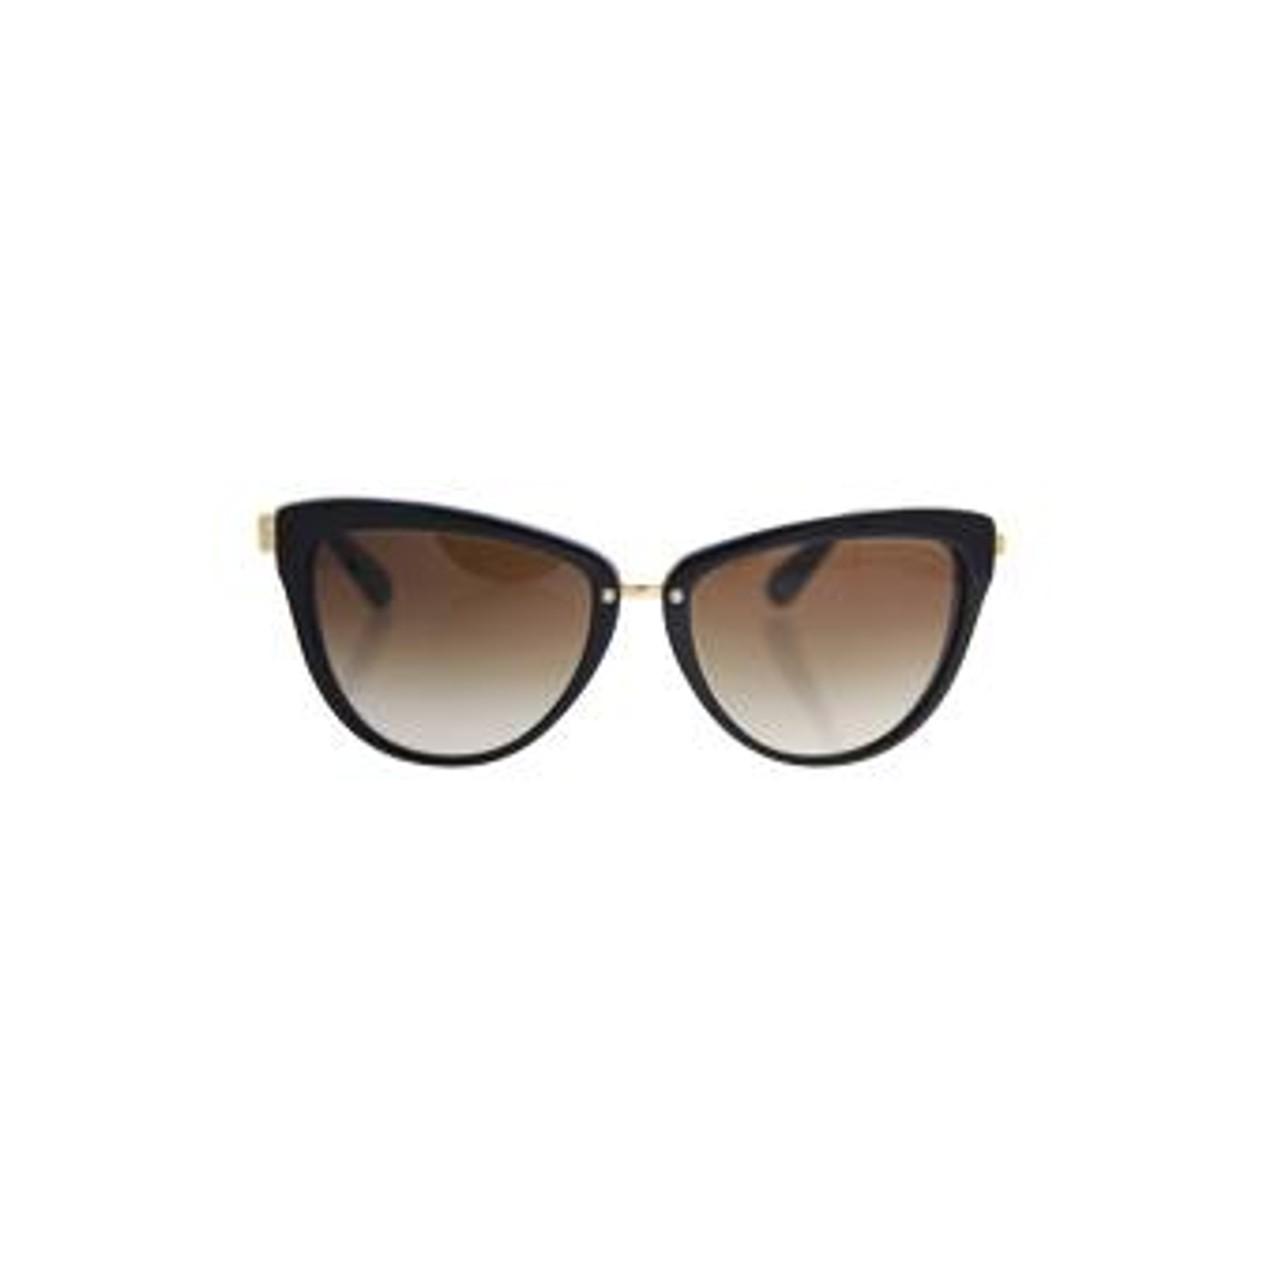 Michael Kors Mk 6039 314713 Abela Ii - Tortoise brown Sunglasses For Women b5004f693c